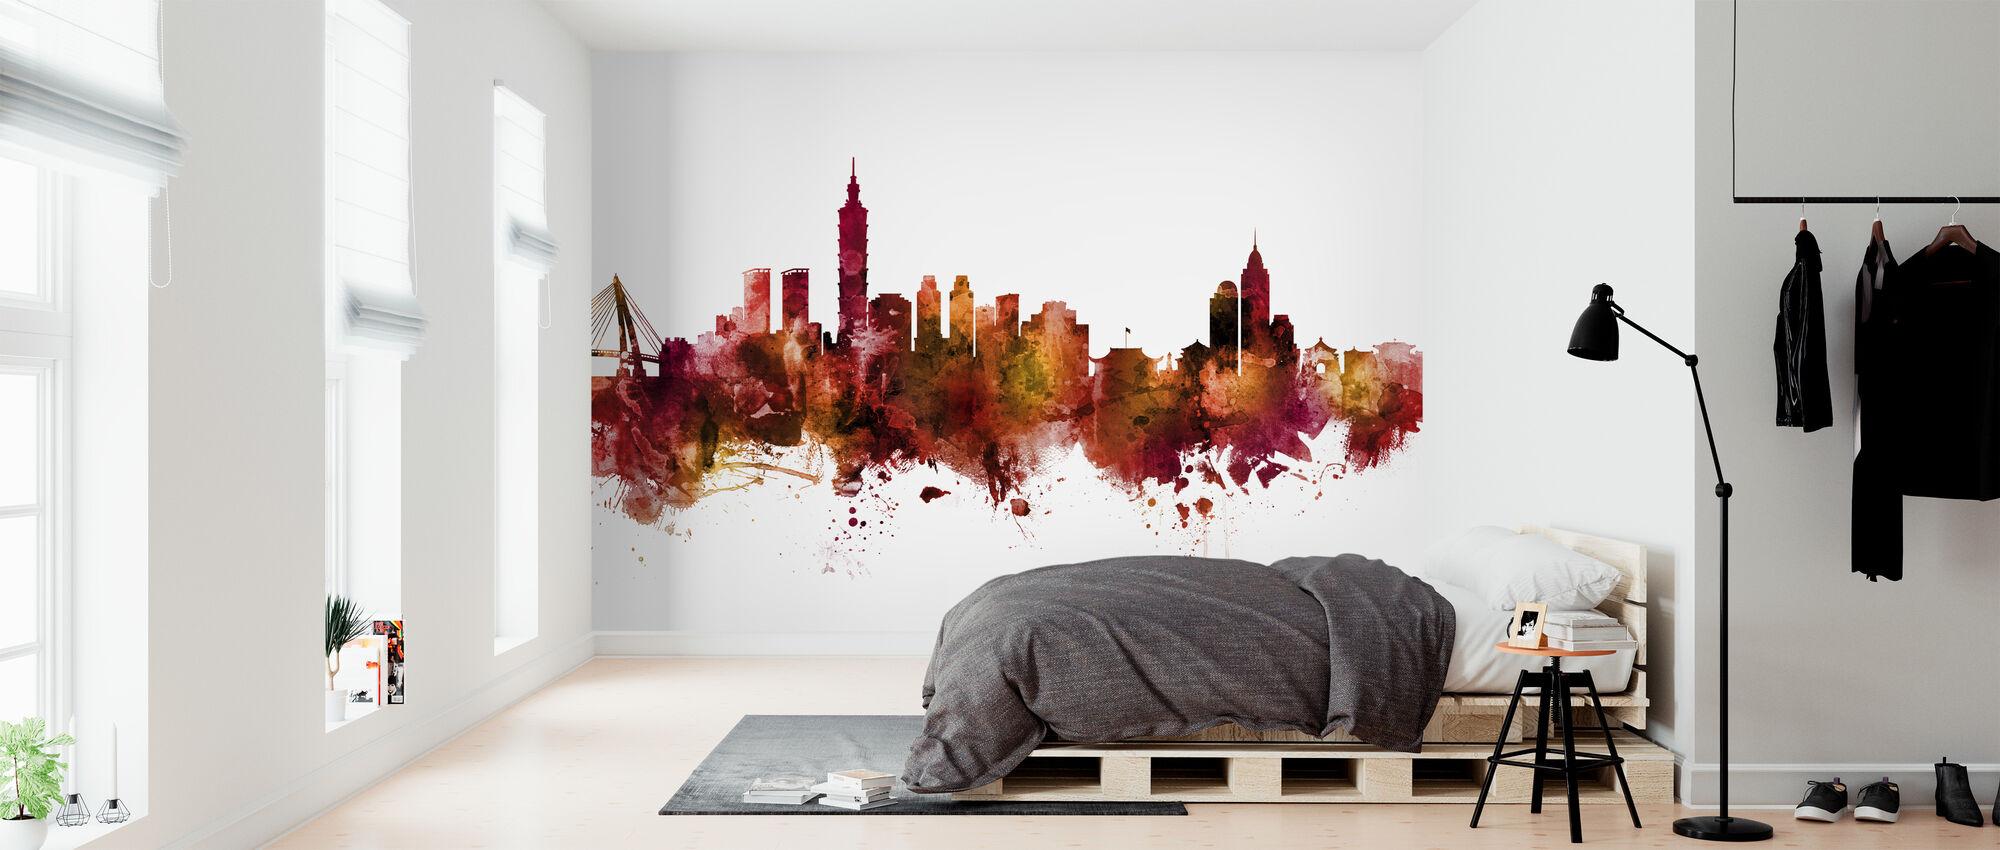 Taipei Taiwan Skyline - Wallpaper - Bedroom